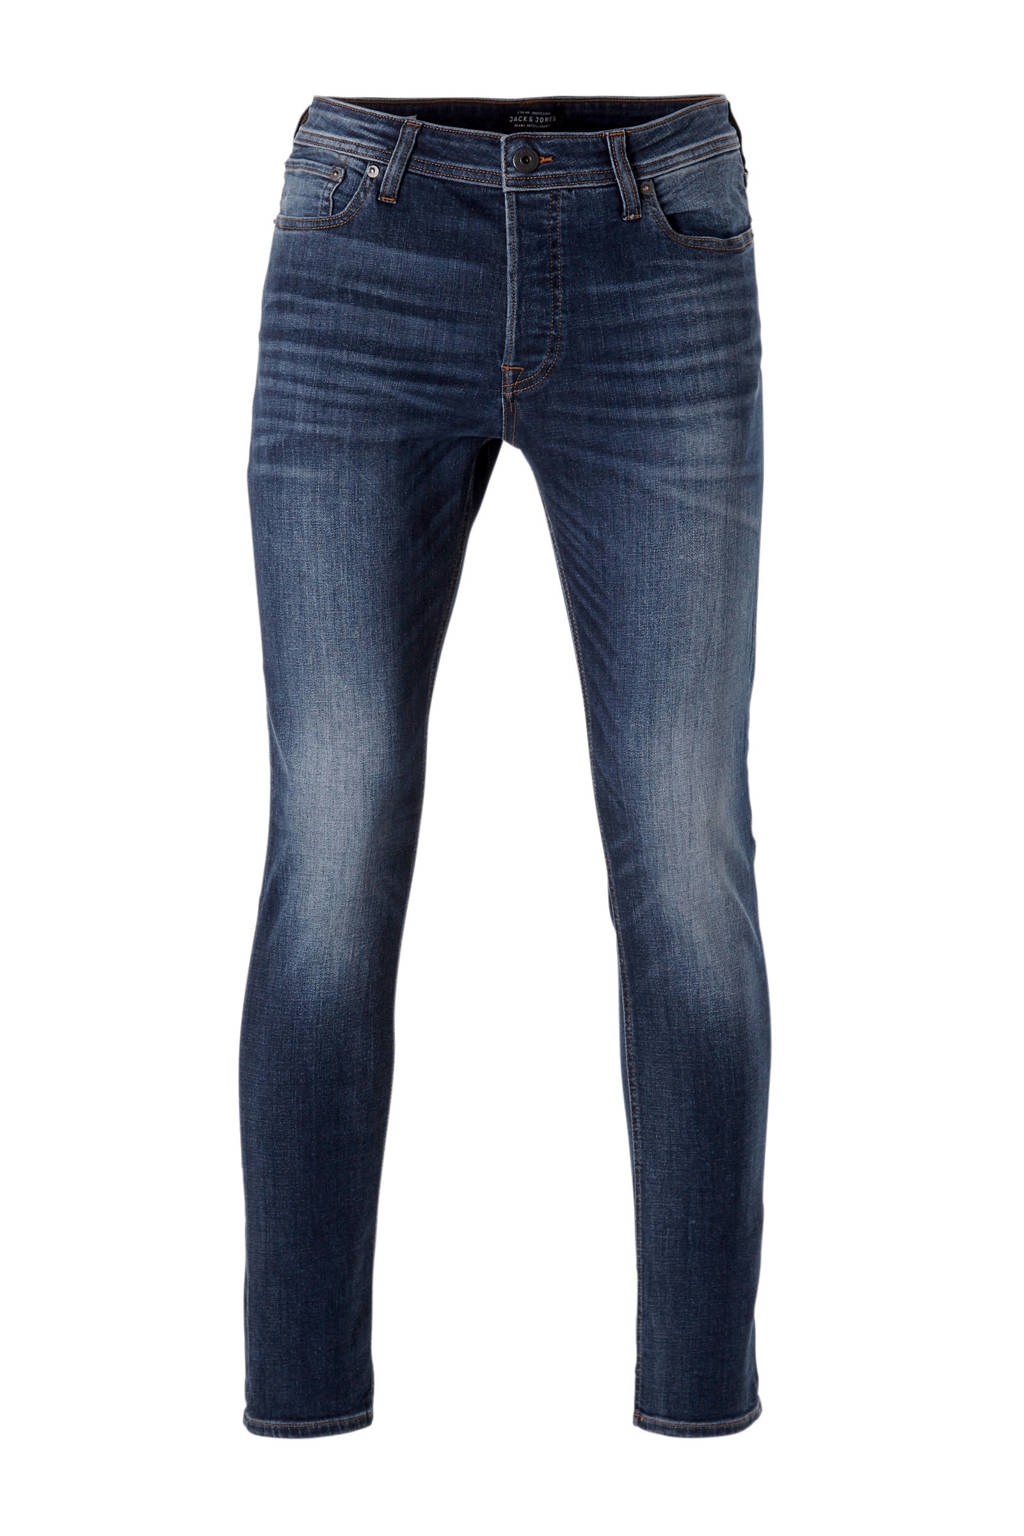 Jack & Jones Intelligence slim fit jeans, Dark denim